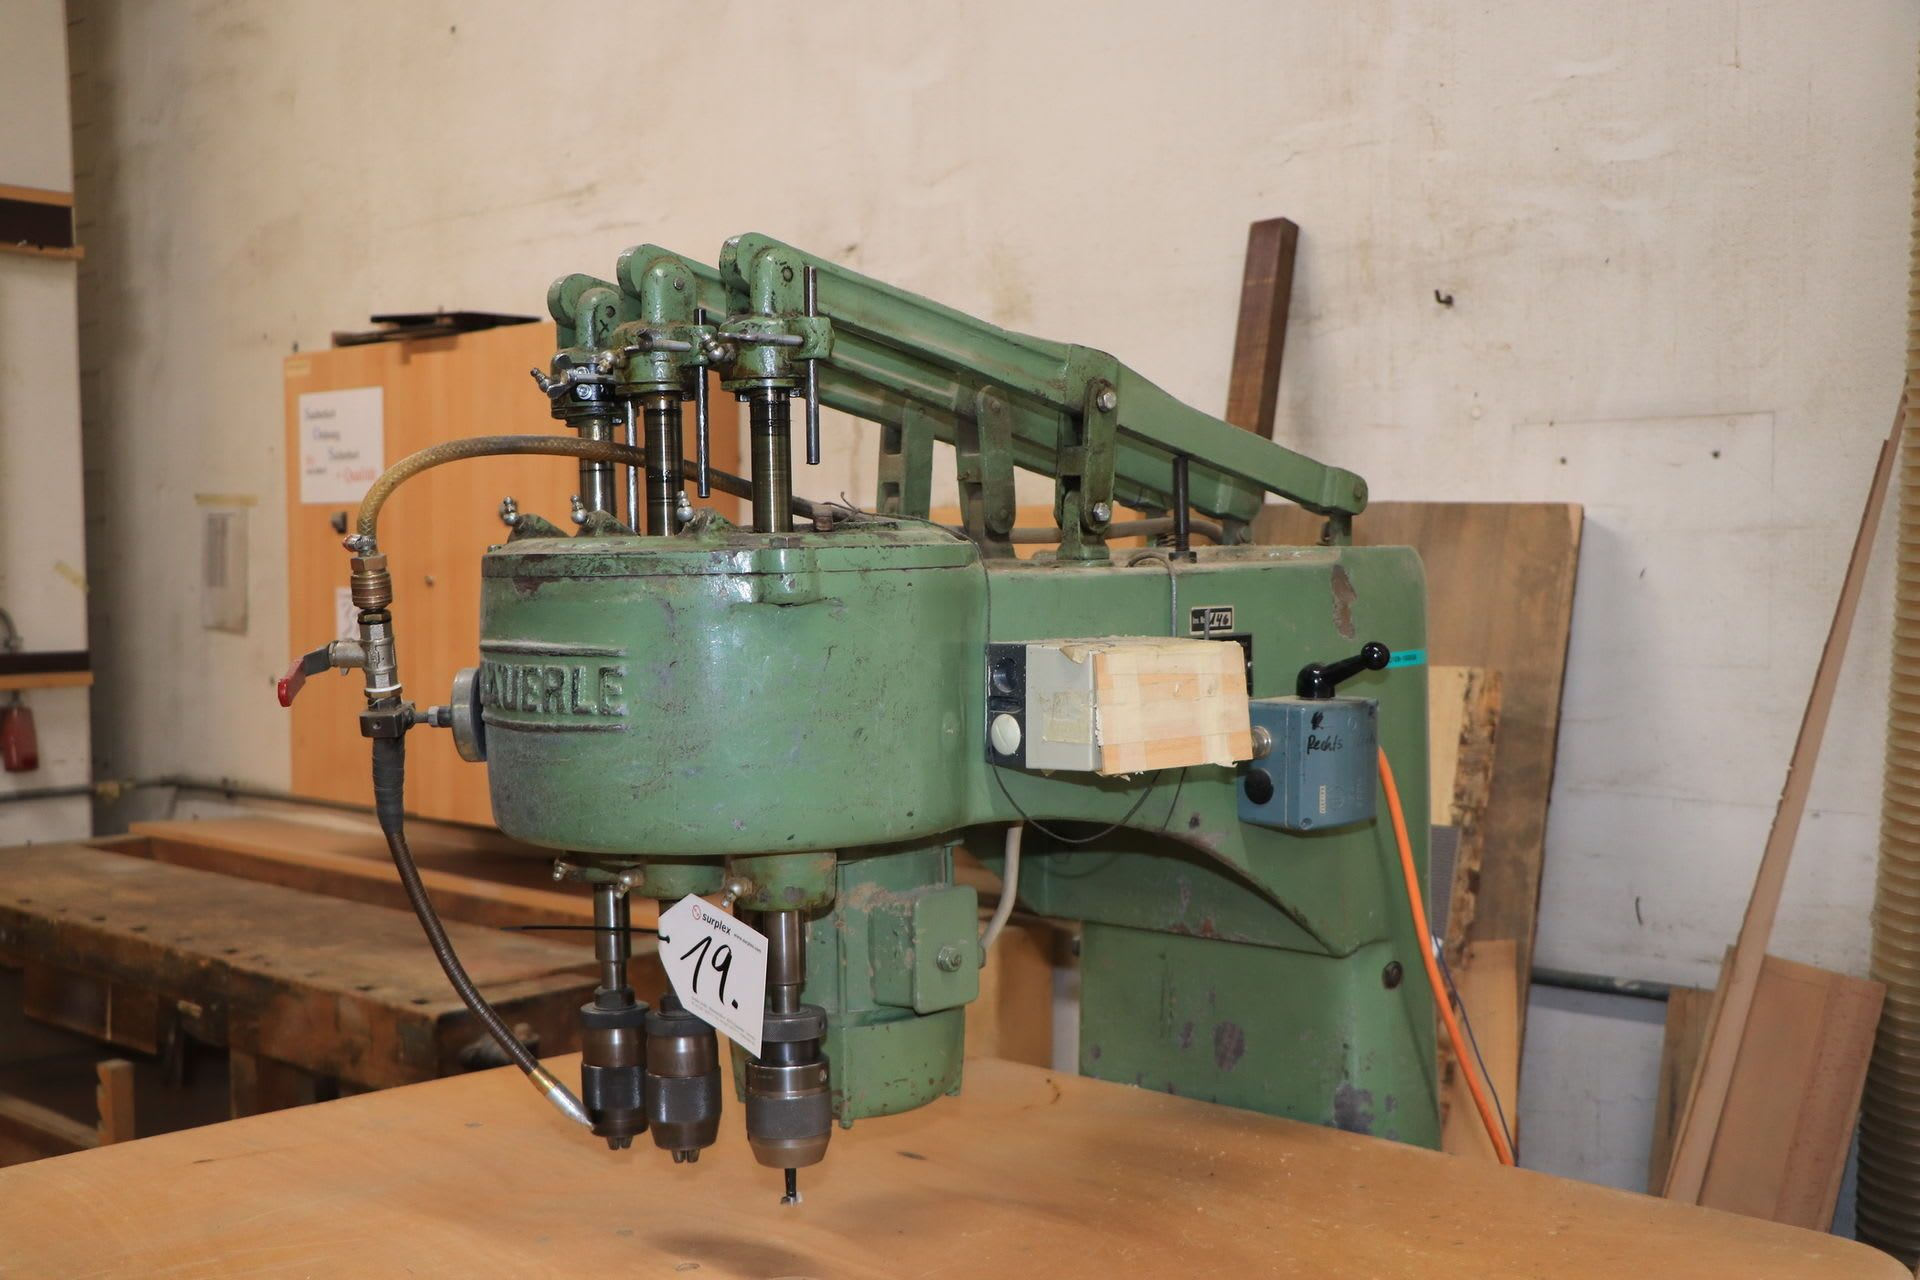 BÄUERLE AL 3-Spindel-Bohrmaschine